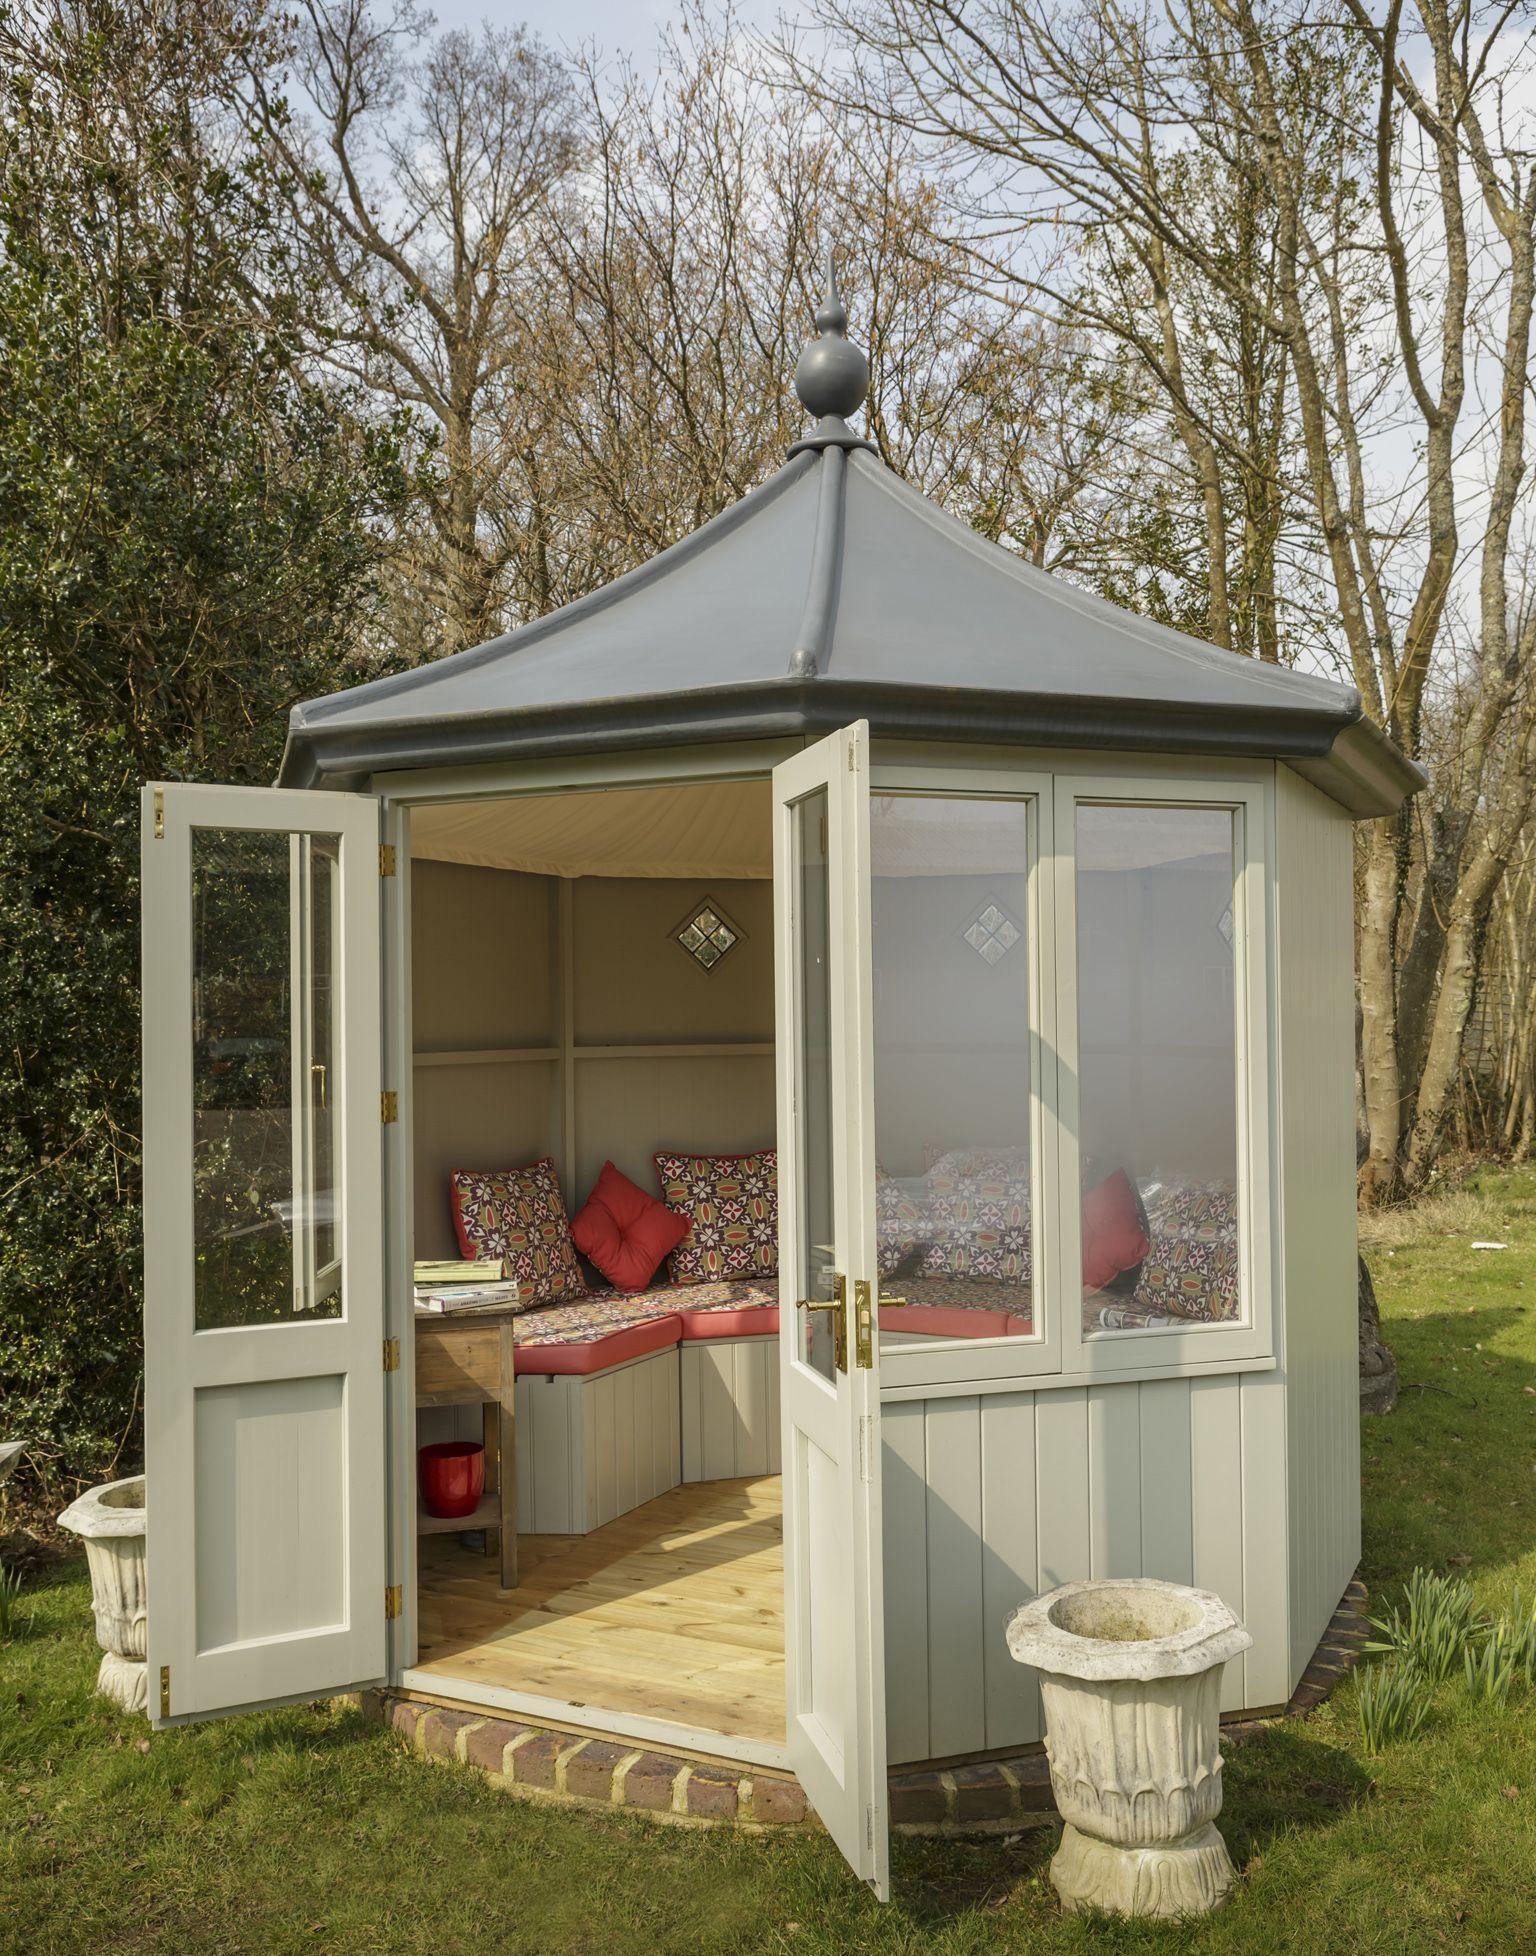 Octagonal Summerhouse By Garden Affairs Painted